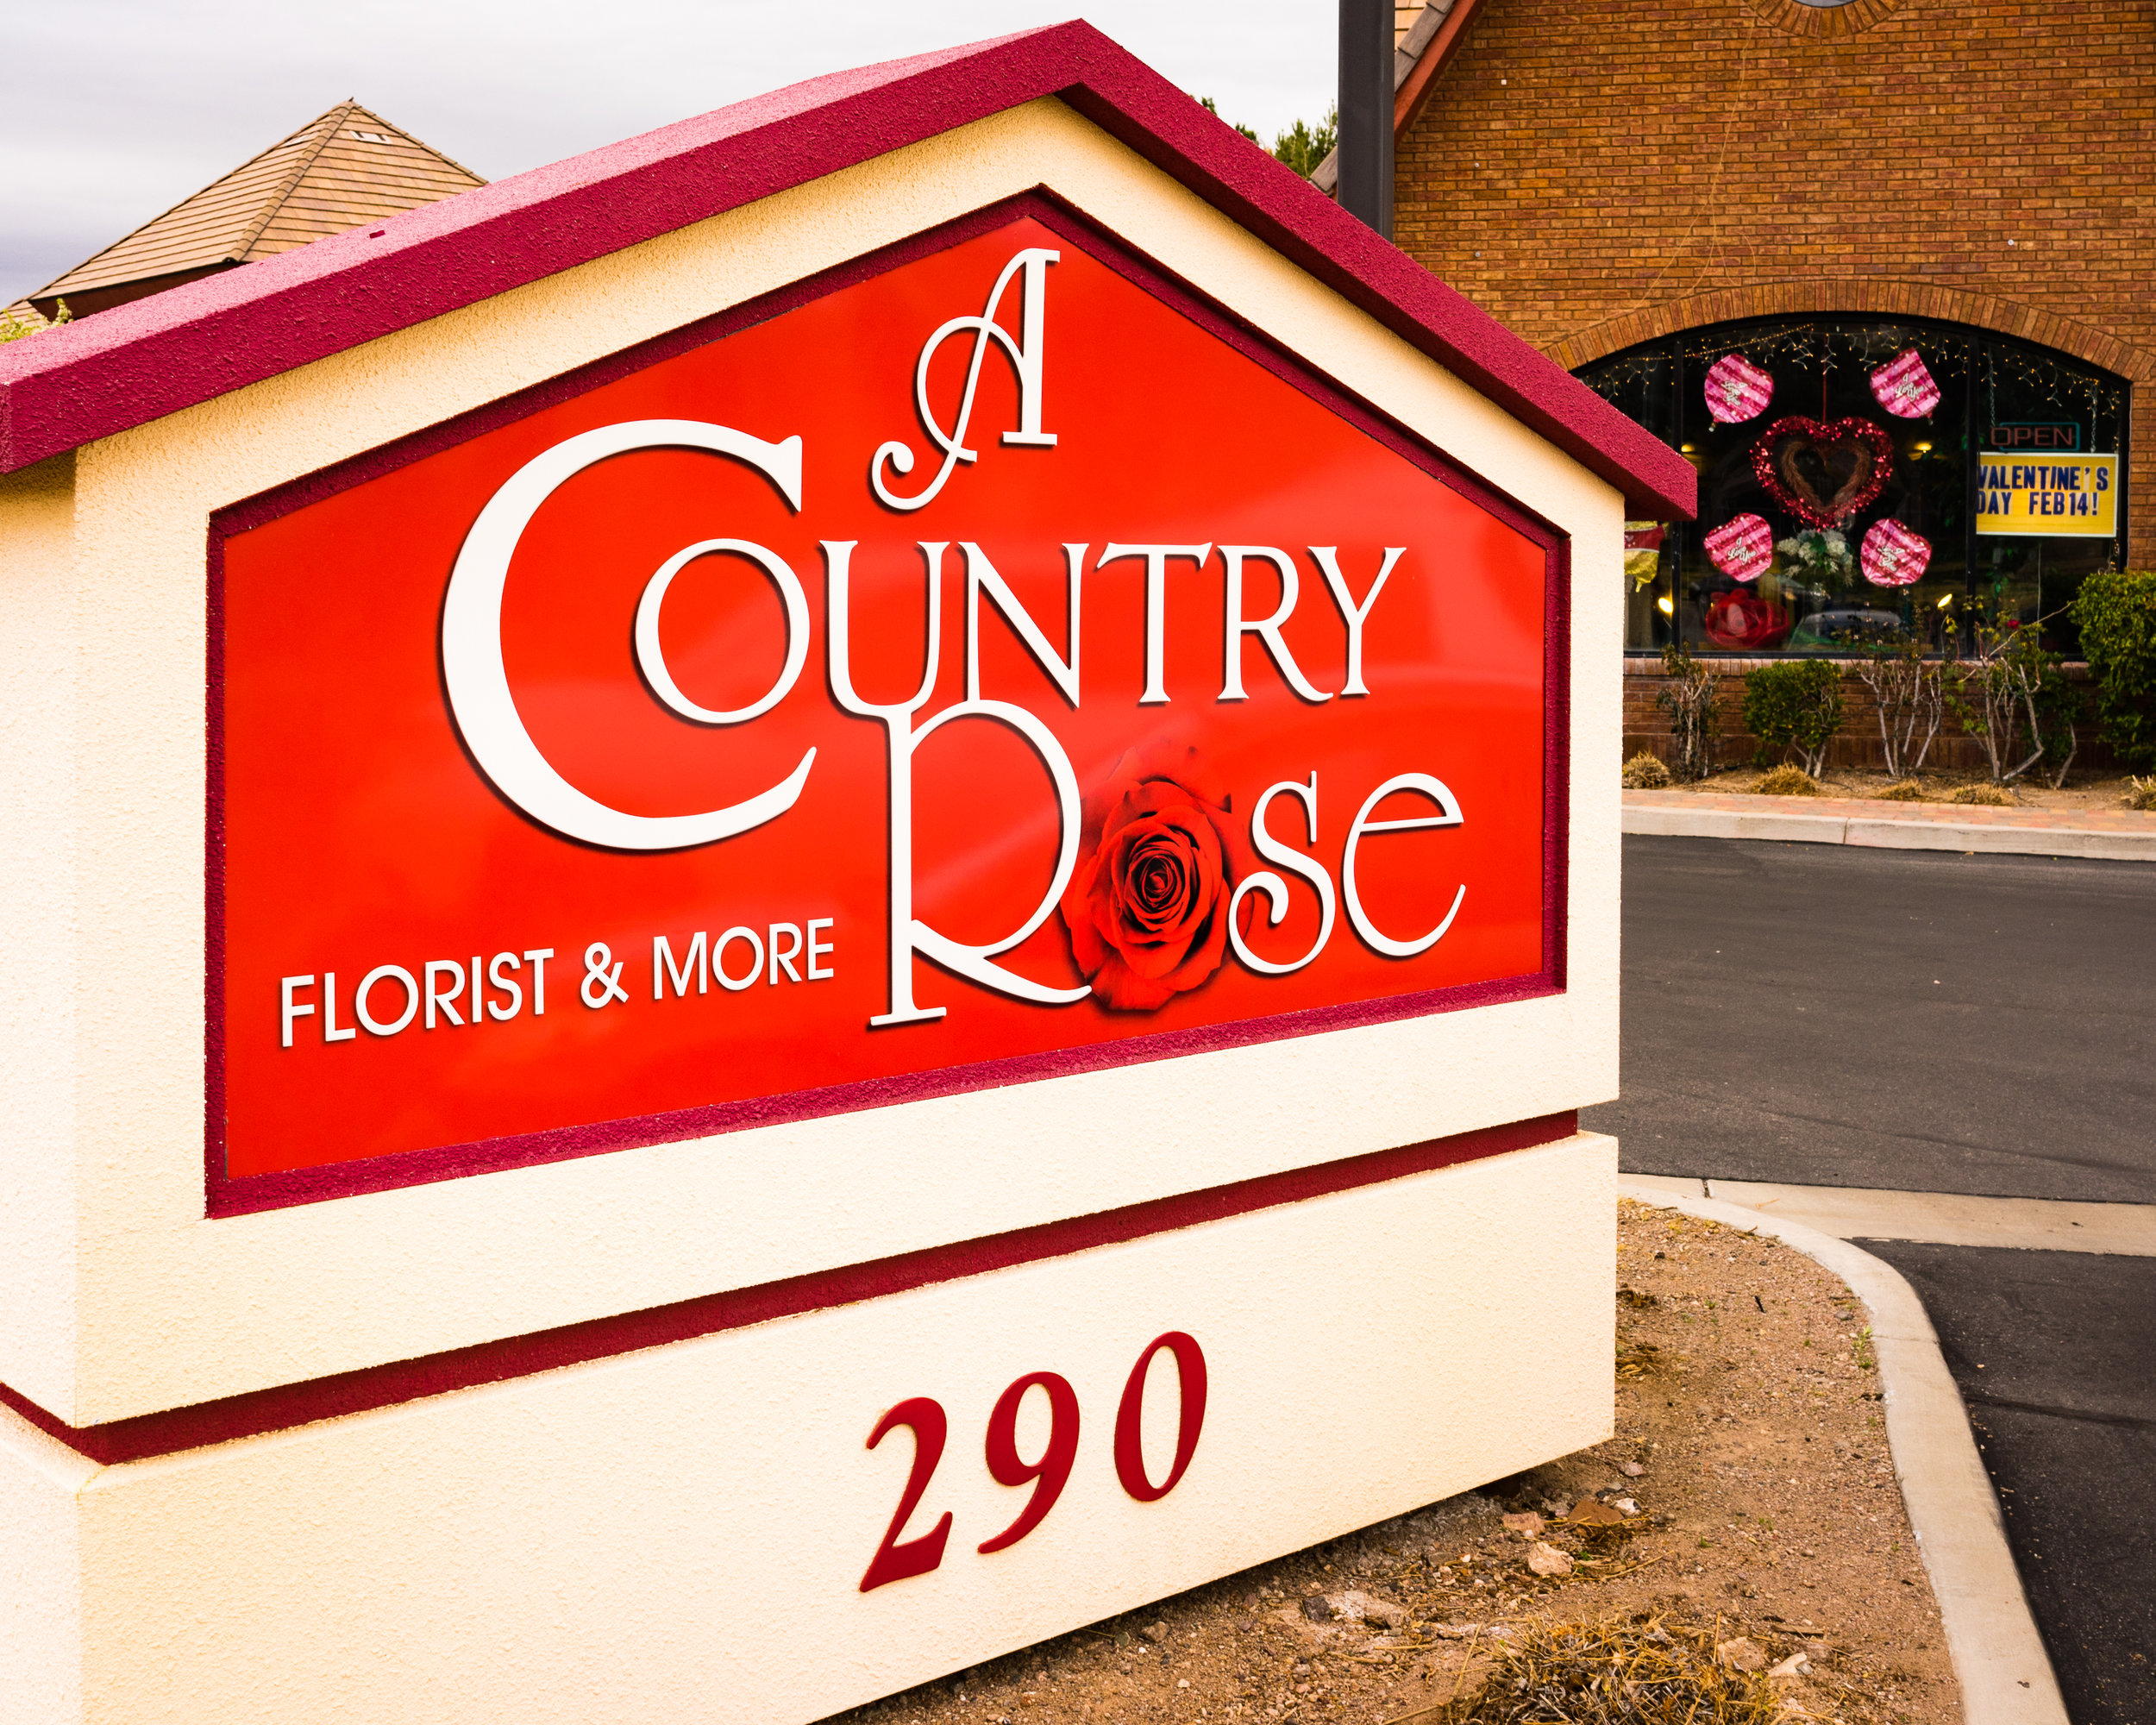 Country_Rose_Valintine_Day_2017-2.jpg